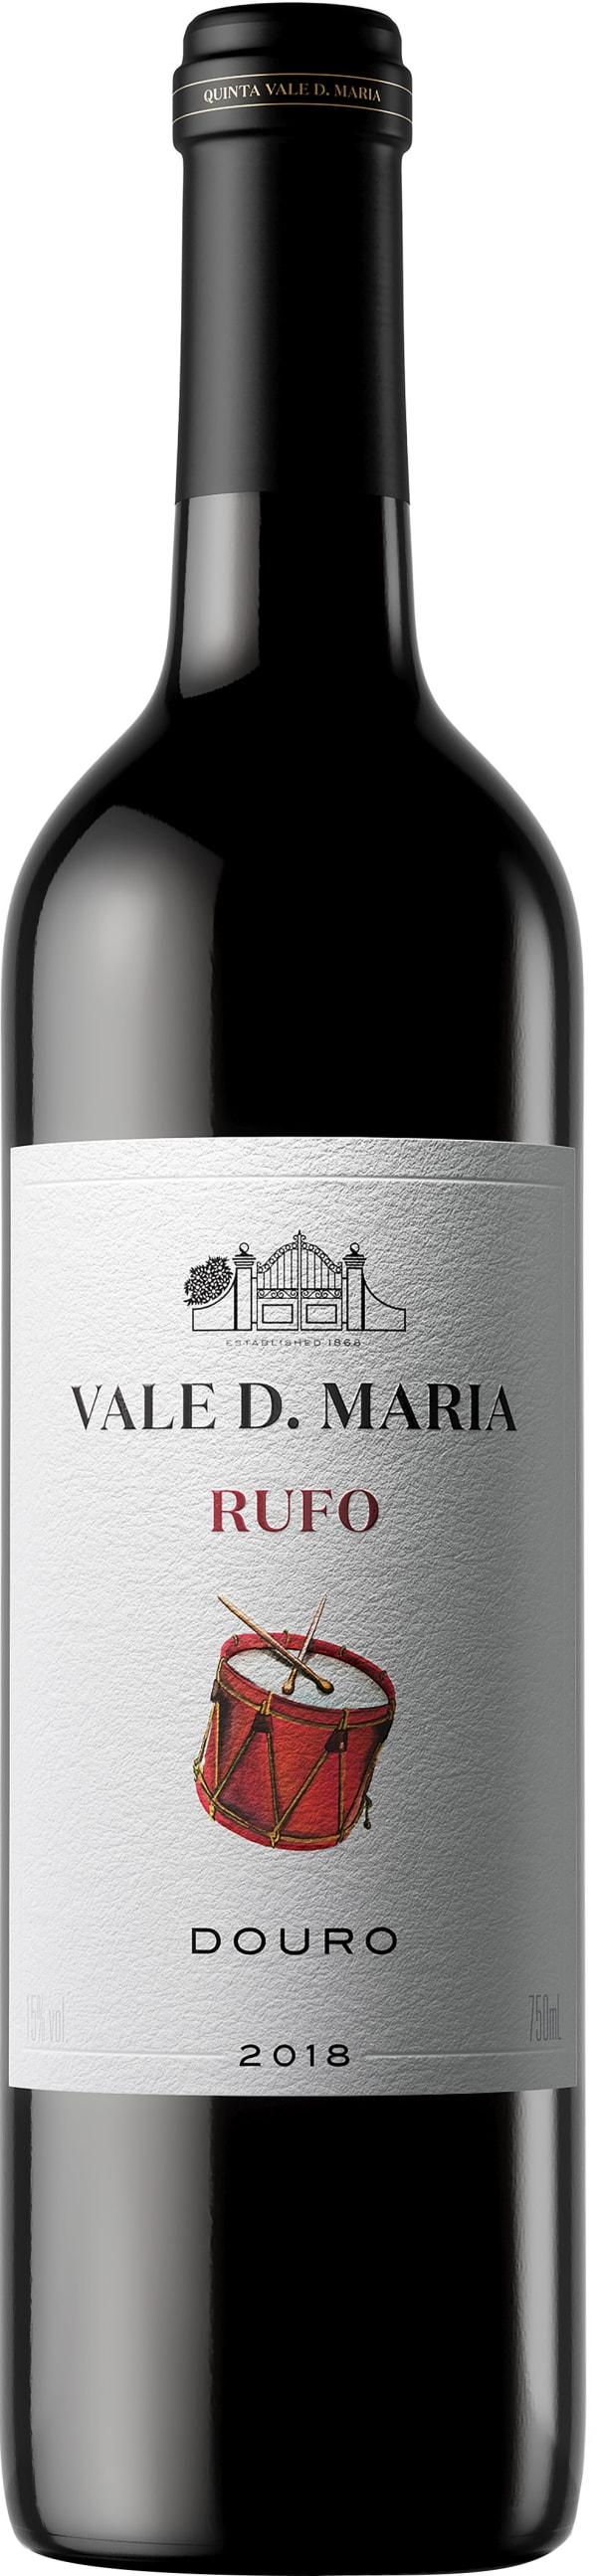 Vale D. Maria Rufo 2014